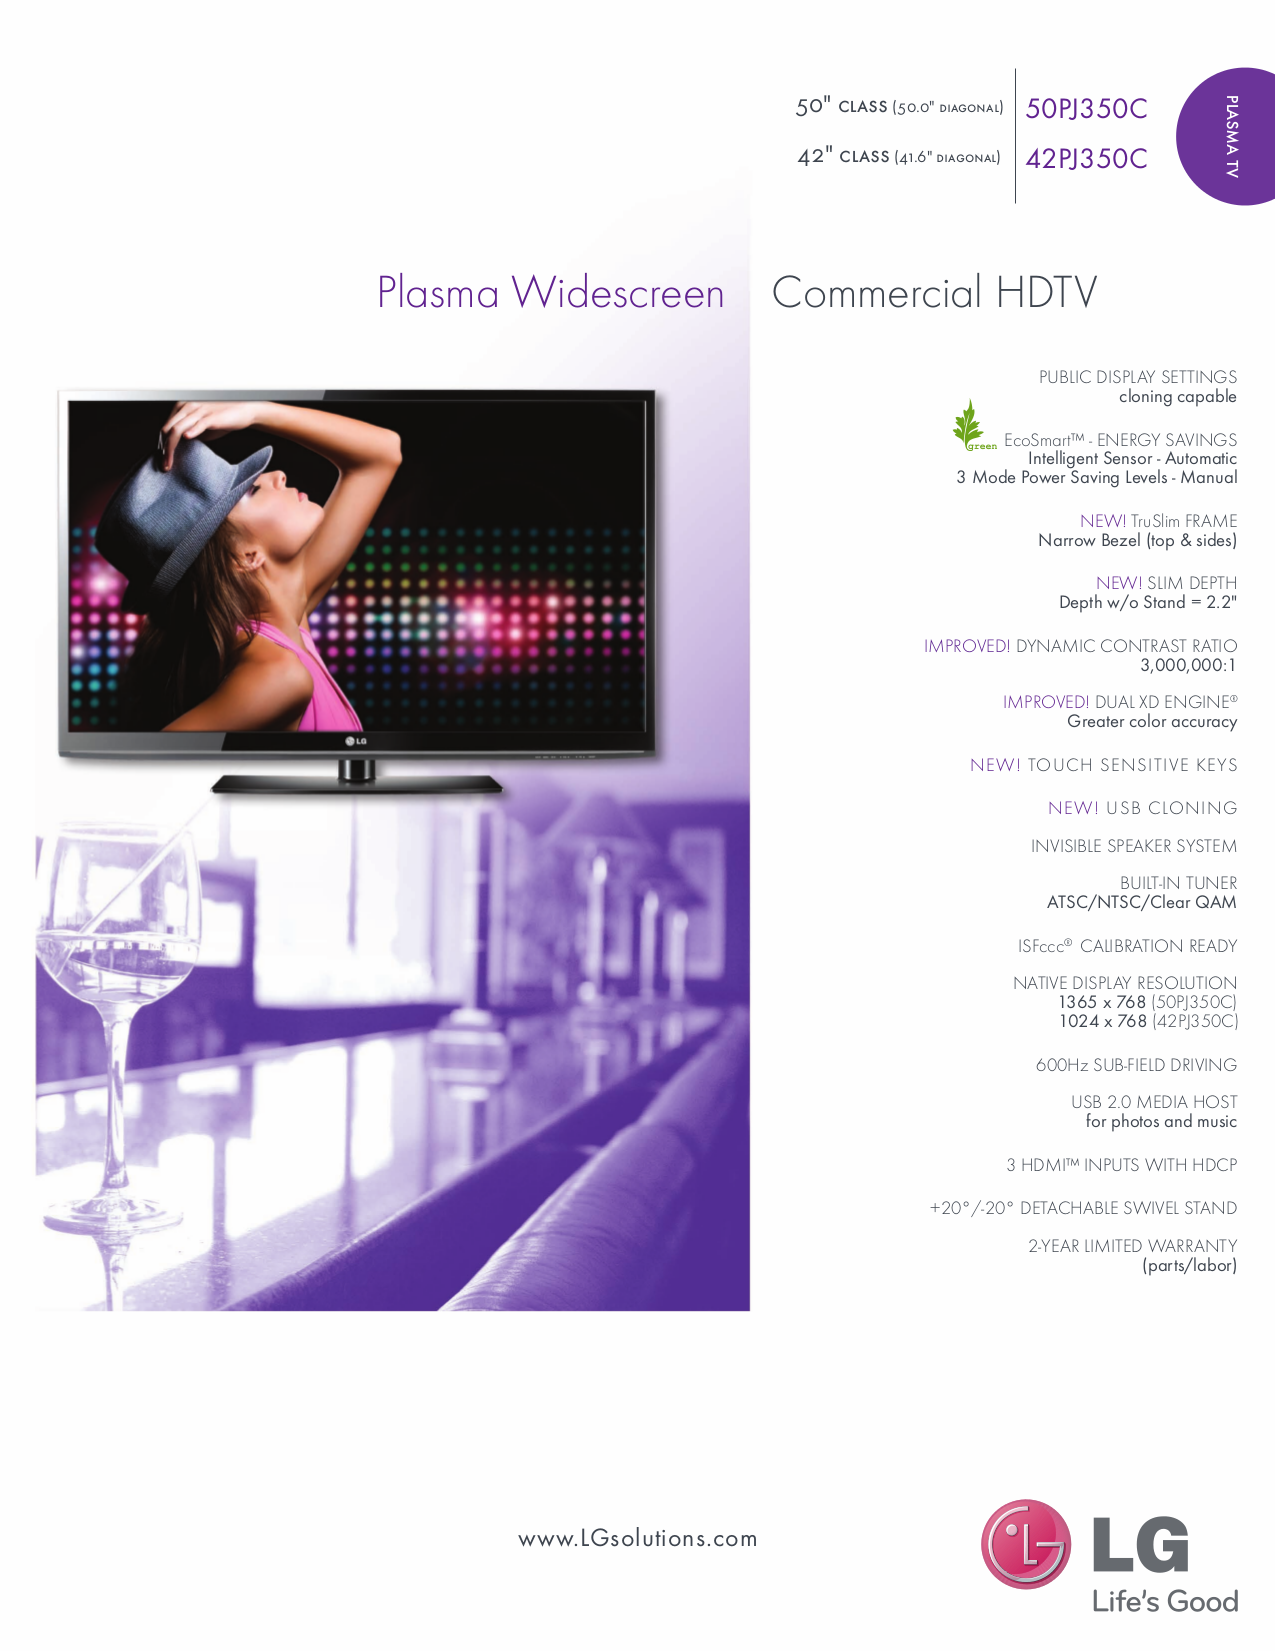 pdf for LG TV 42PJ350C manual